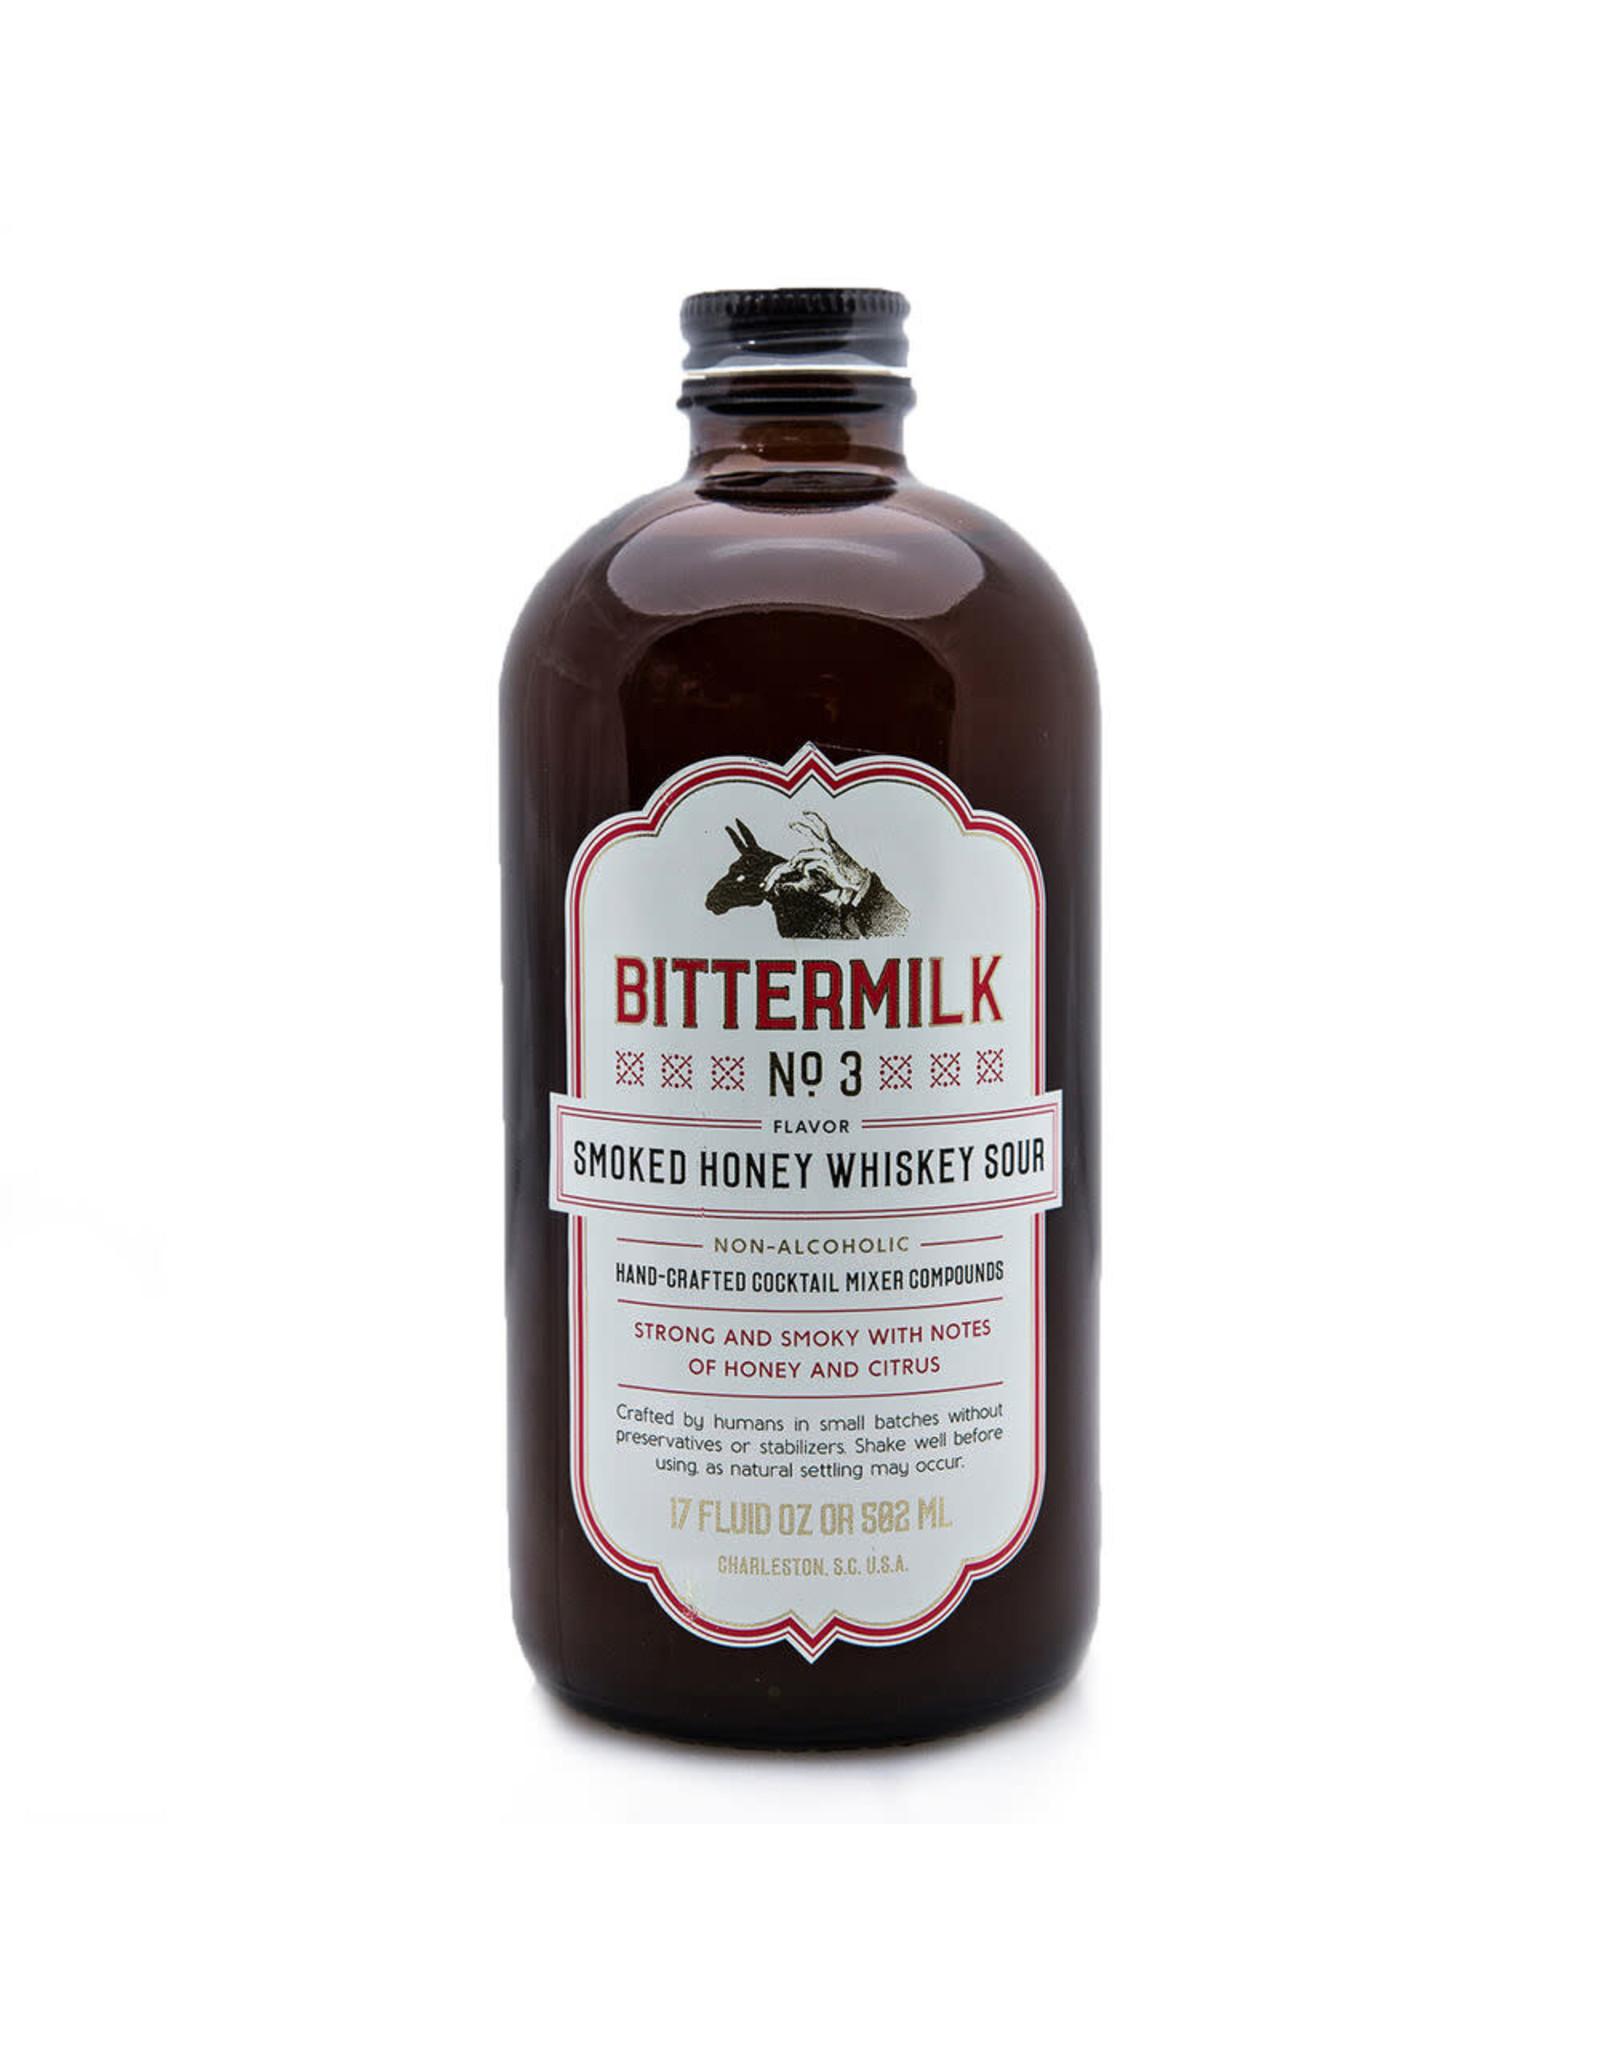 Bittermilk Bittermilk No 3 Smoked Honey Whiskey Sour